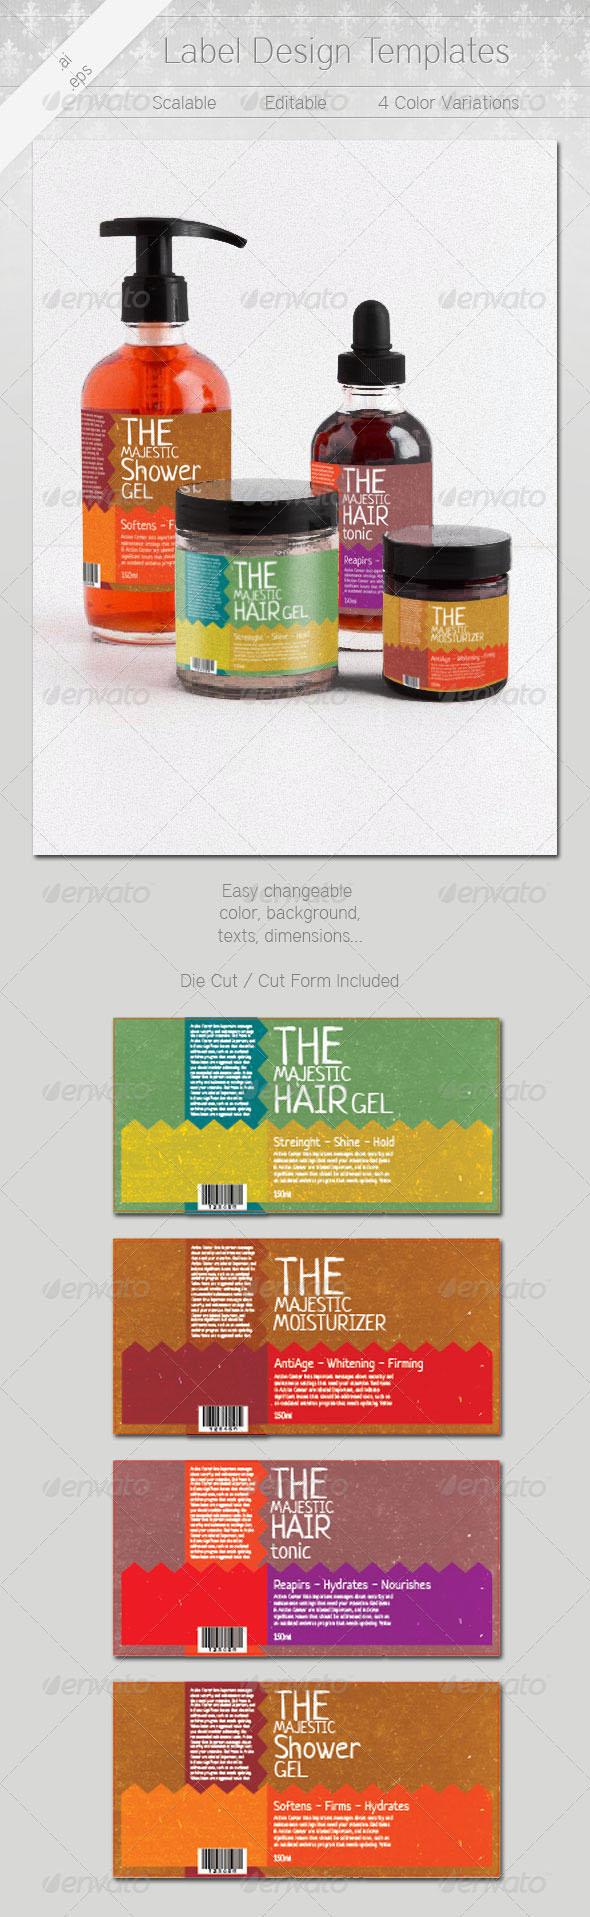 label-templates1